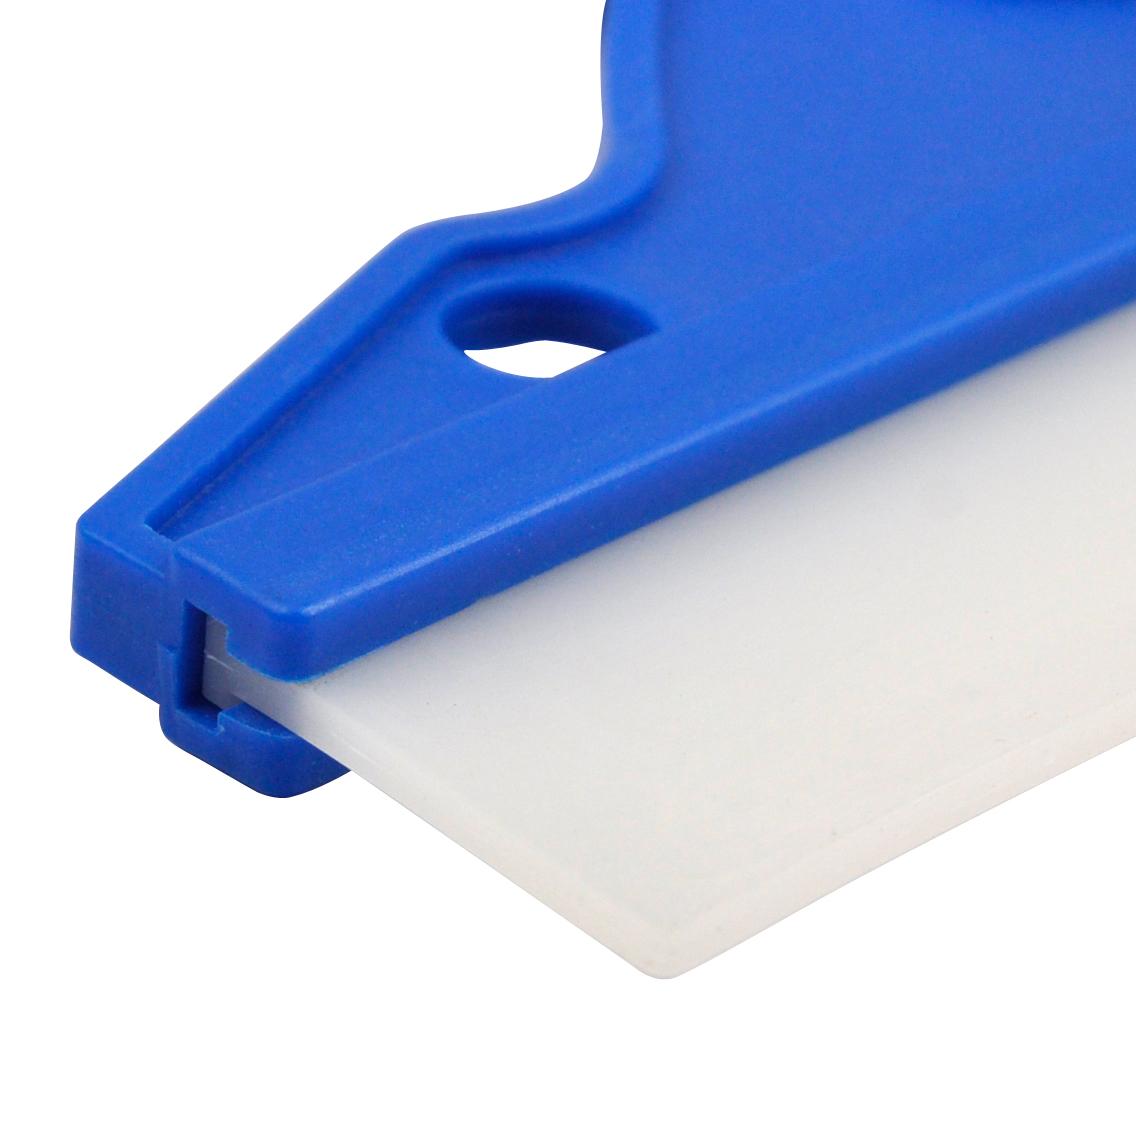 trixes silikon fensterglas wischer reinigung klinge ebay. Black Bedroom Furniture Sets. Home Design Ideas